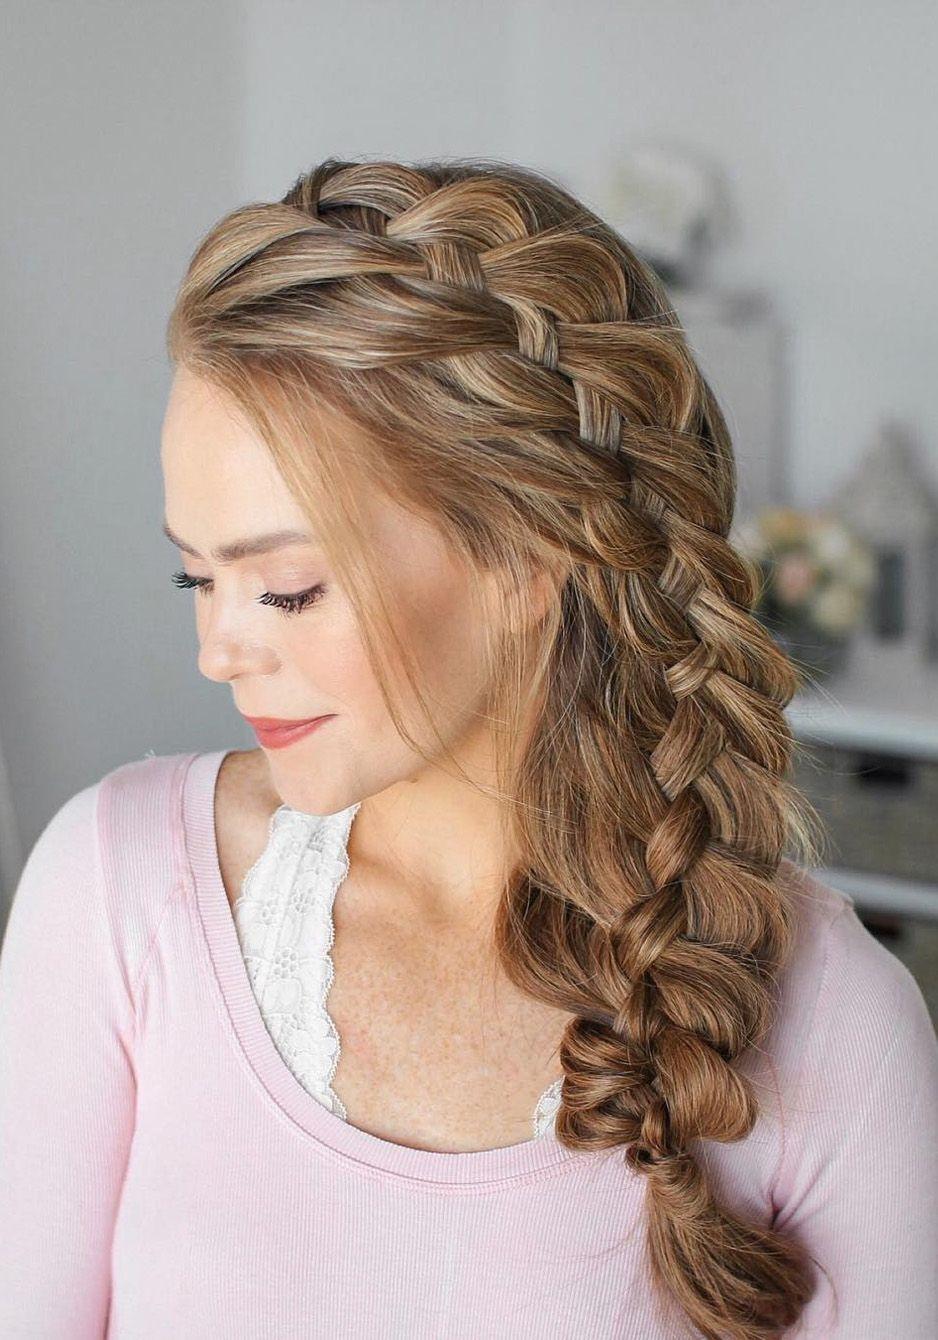 Extreme Gorgeous Woven Braids Ideas For This Winter Hairminia Medium Hair Styles For Women Stylish Hair Hair Styles